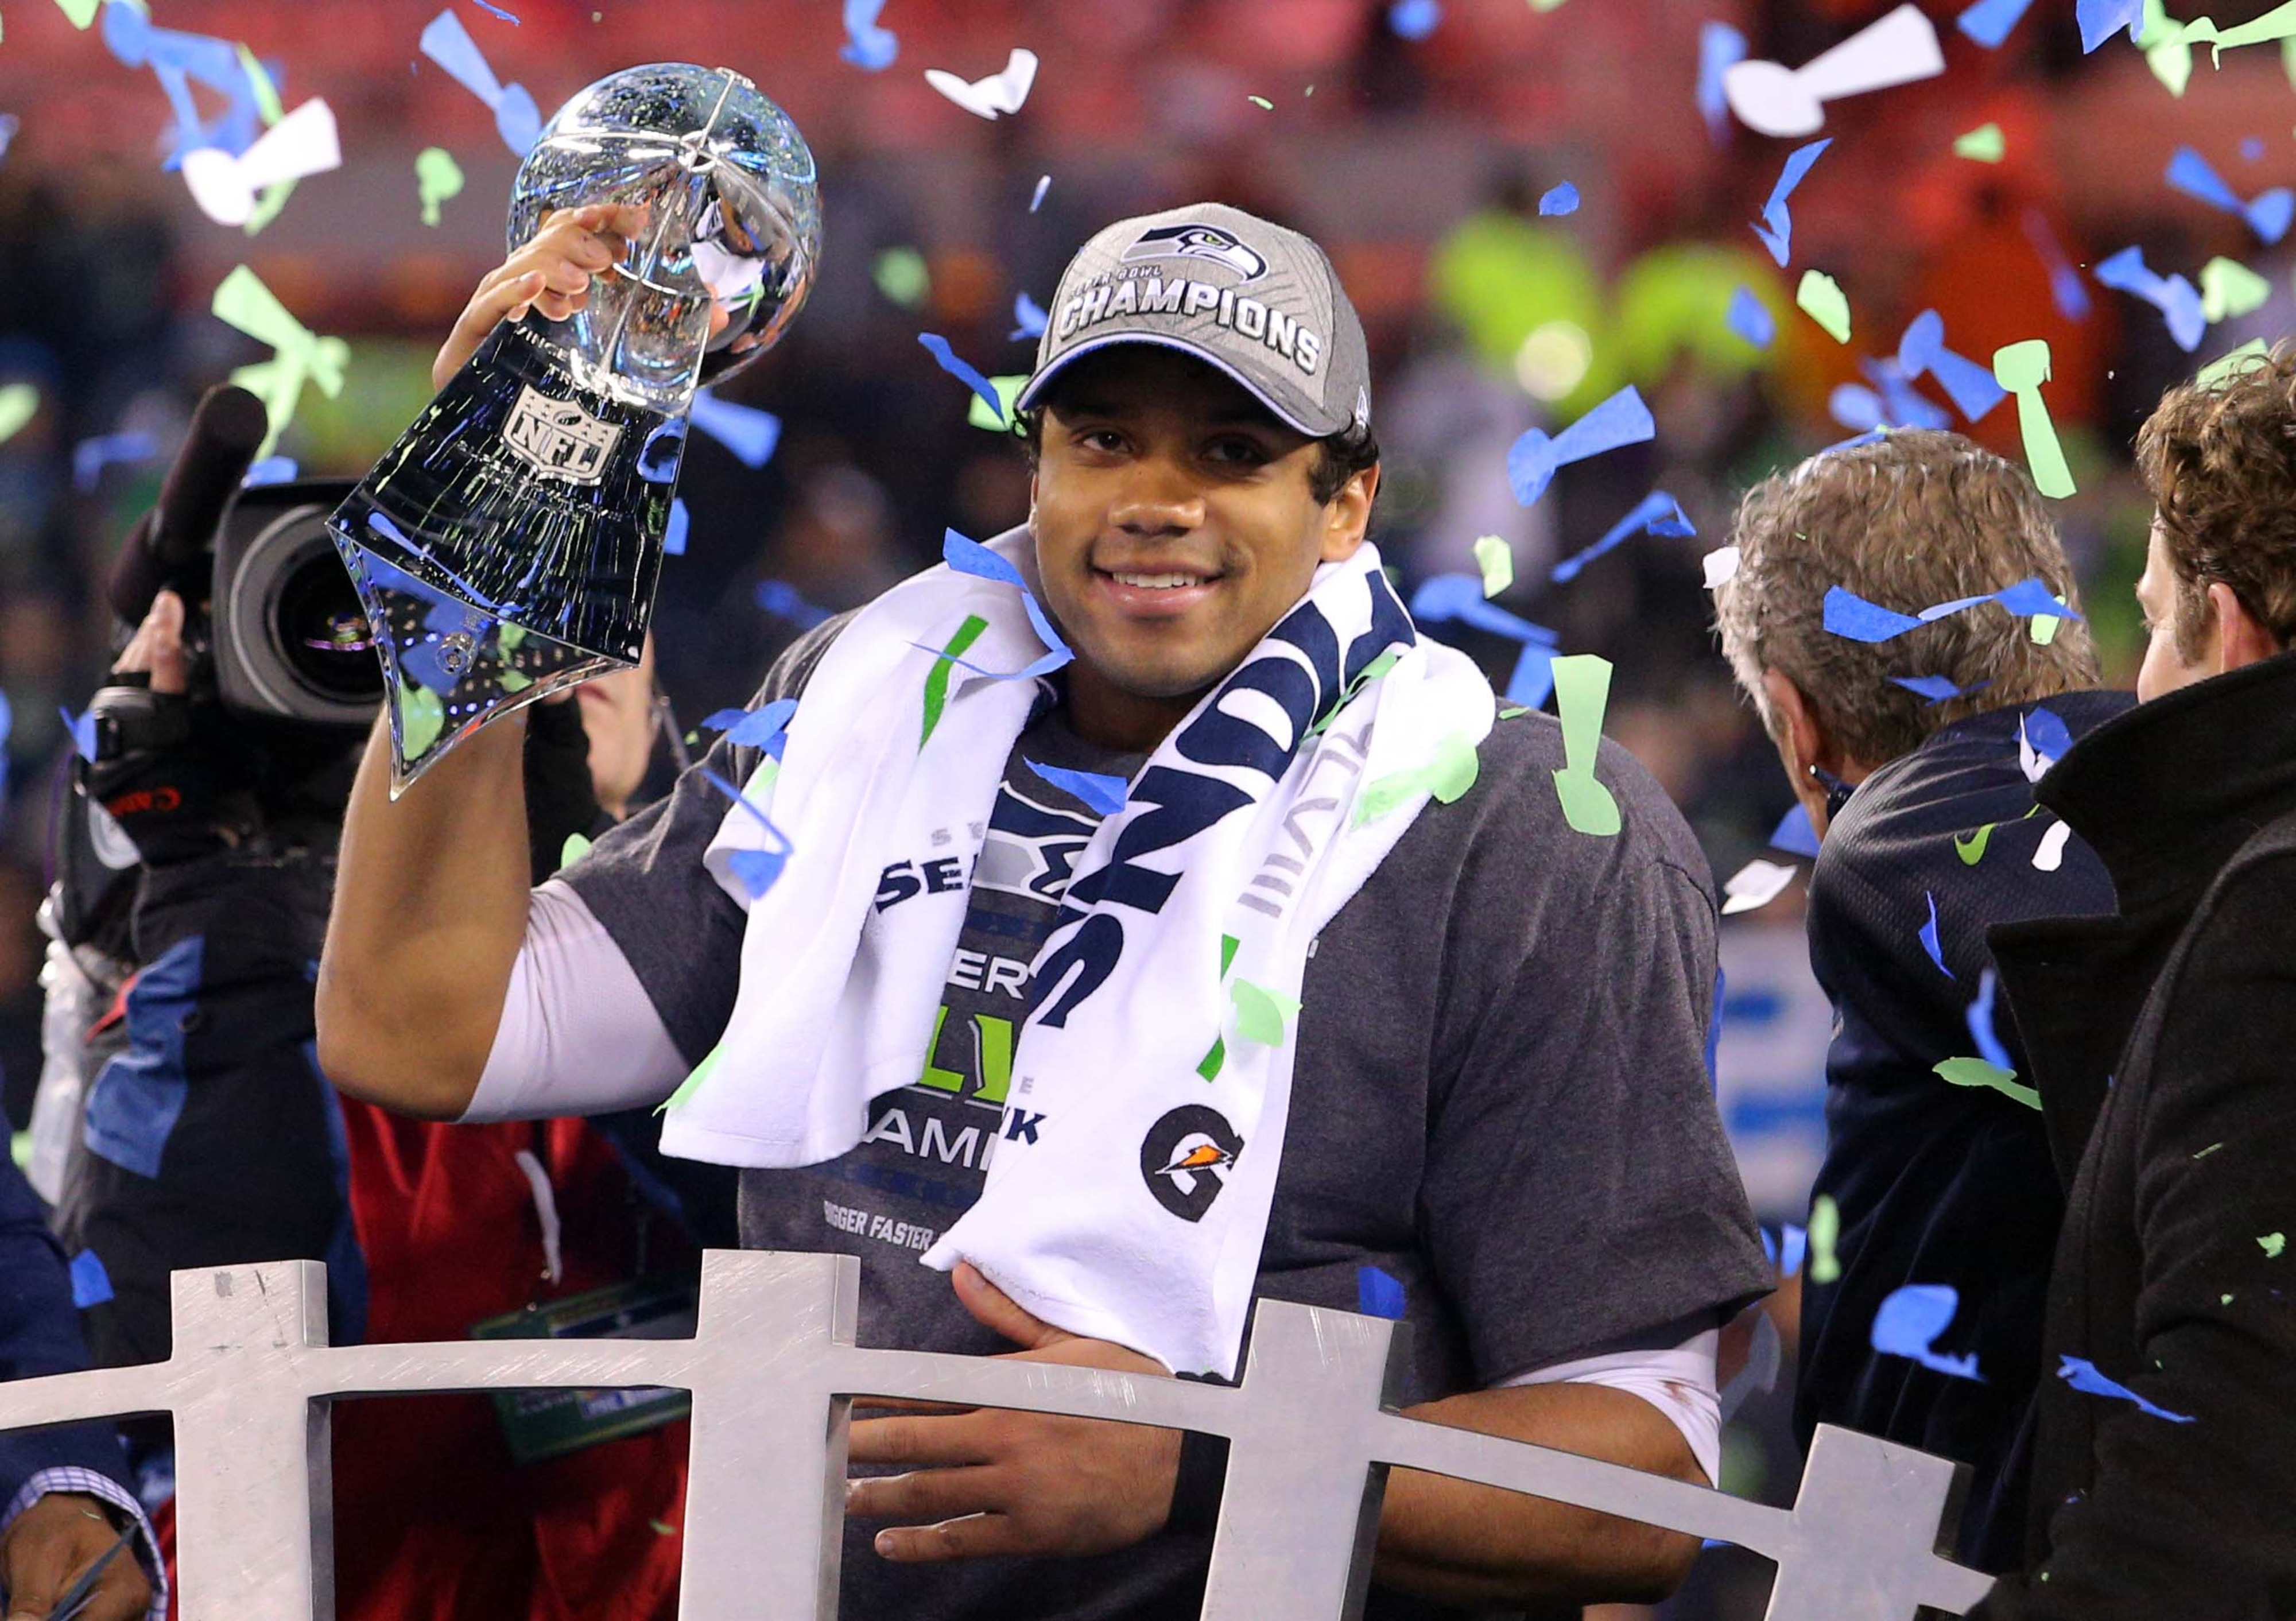 Super Bowl champion Russell Wilson will still be at Rangers spring training